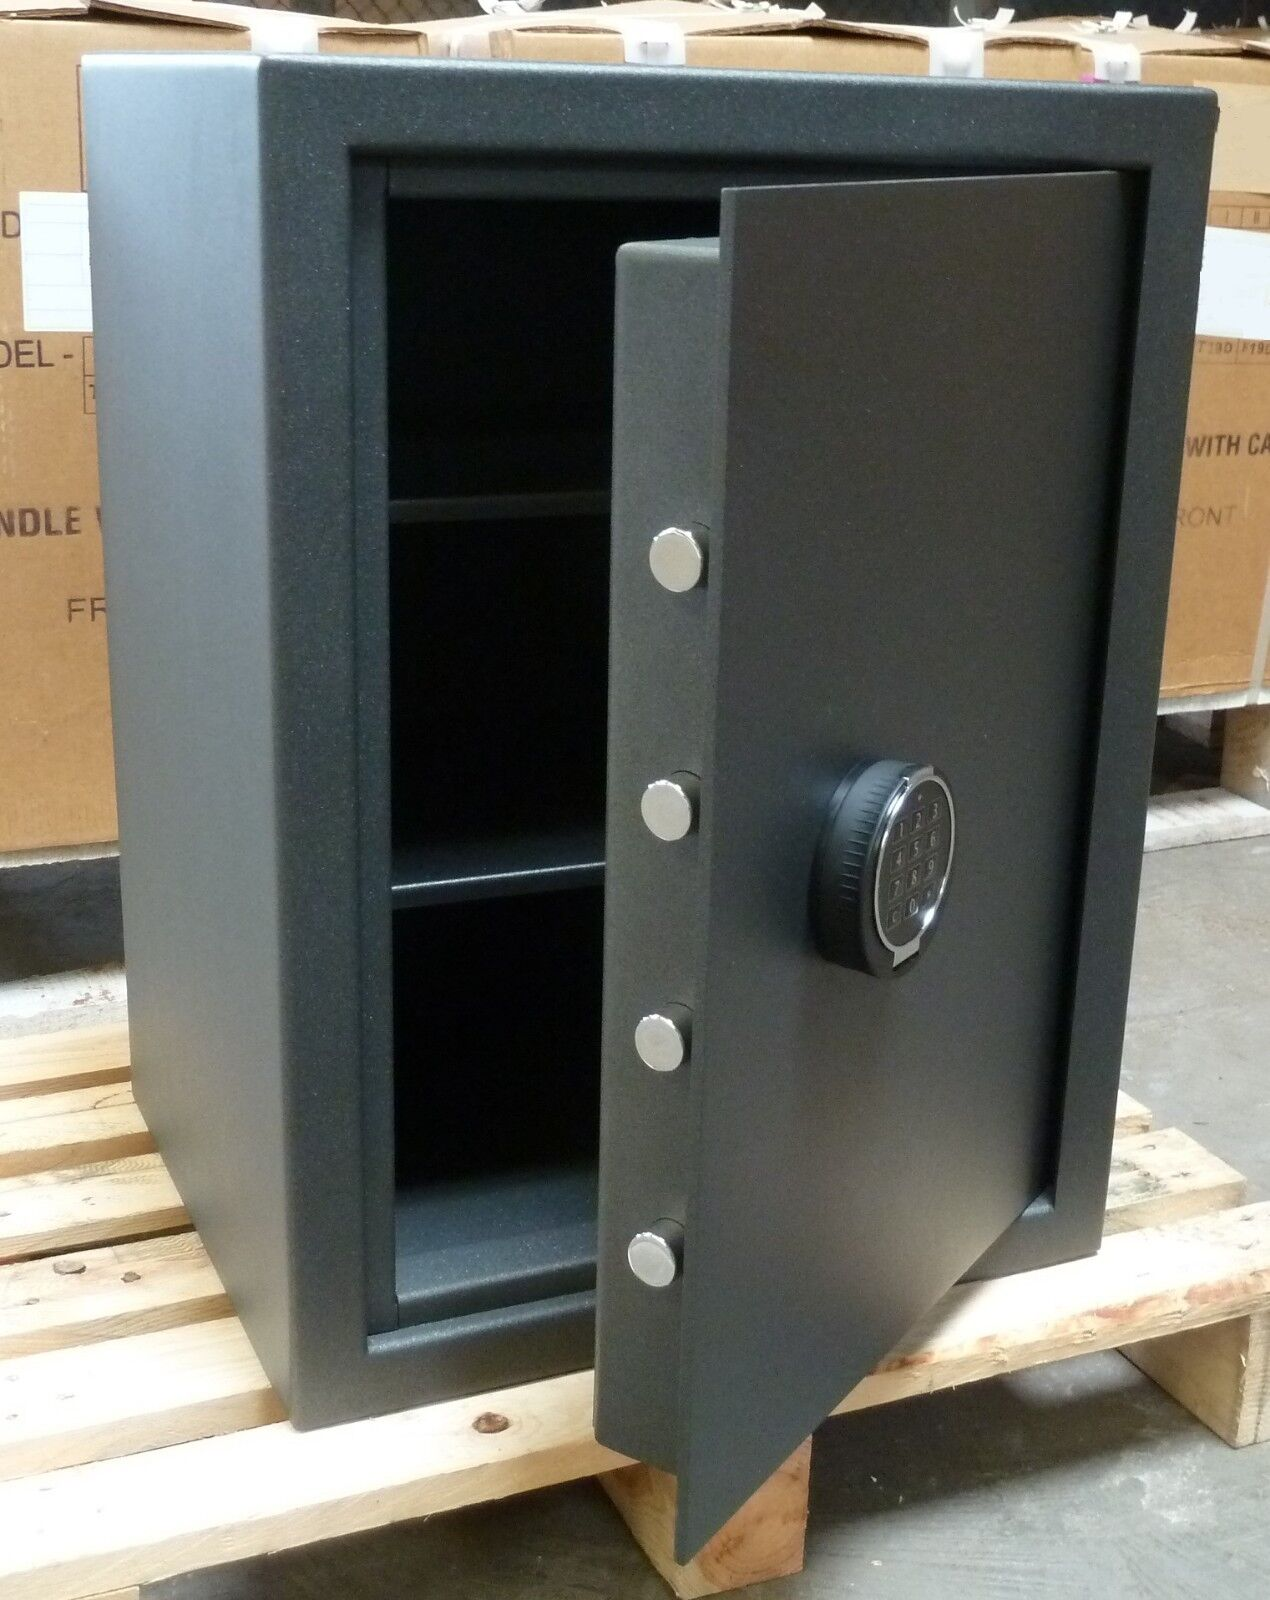 Tresor VdS S2 + Stufe VDMA B Elektronikschloß Wertschutzschrank Wertschutzschrank Wertschutzschrank Möbel Safe 92 Kg 864bf0